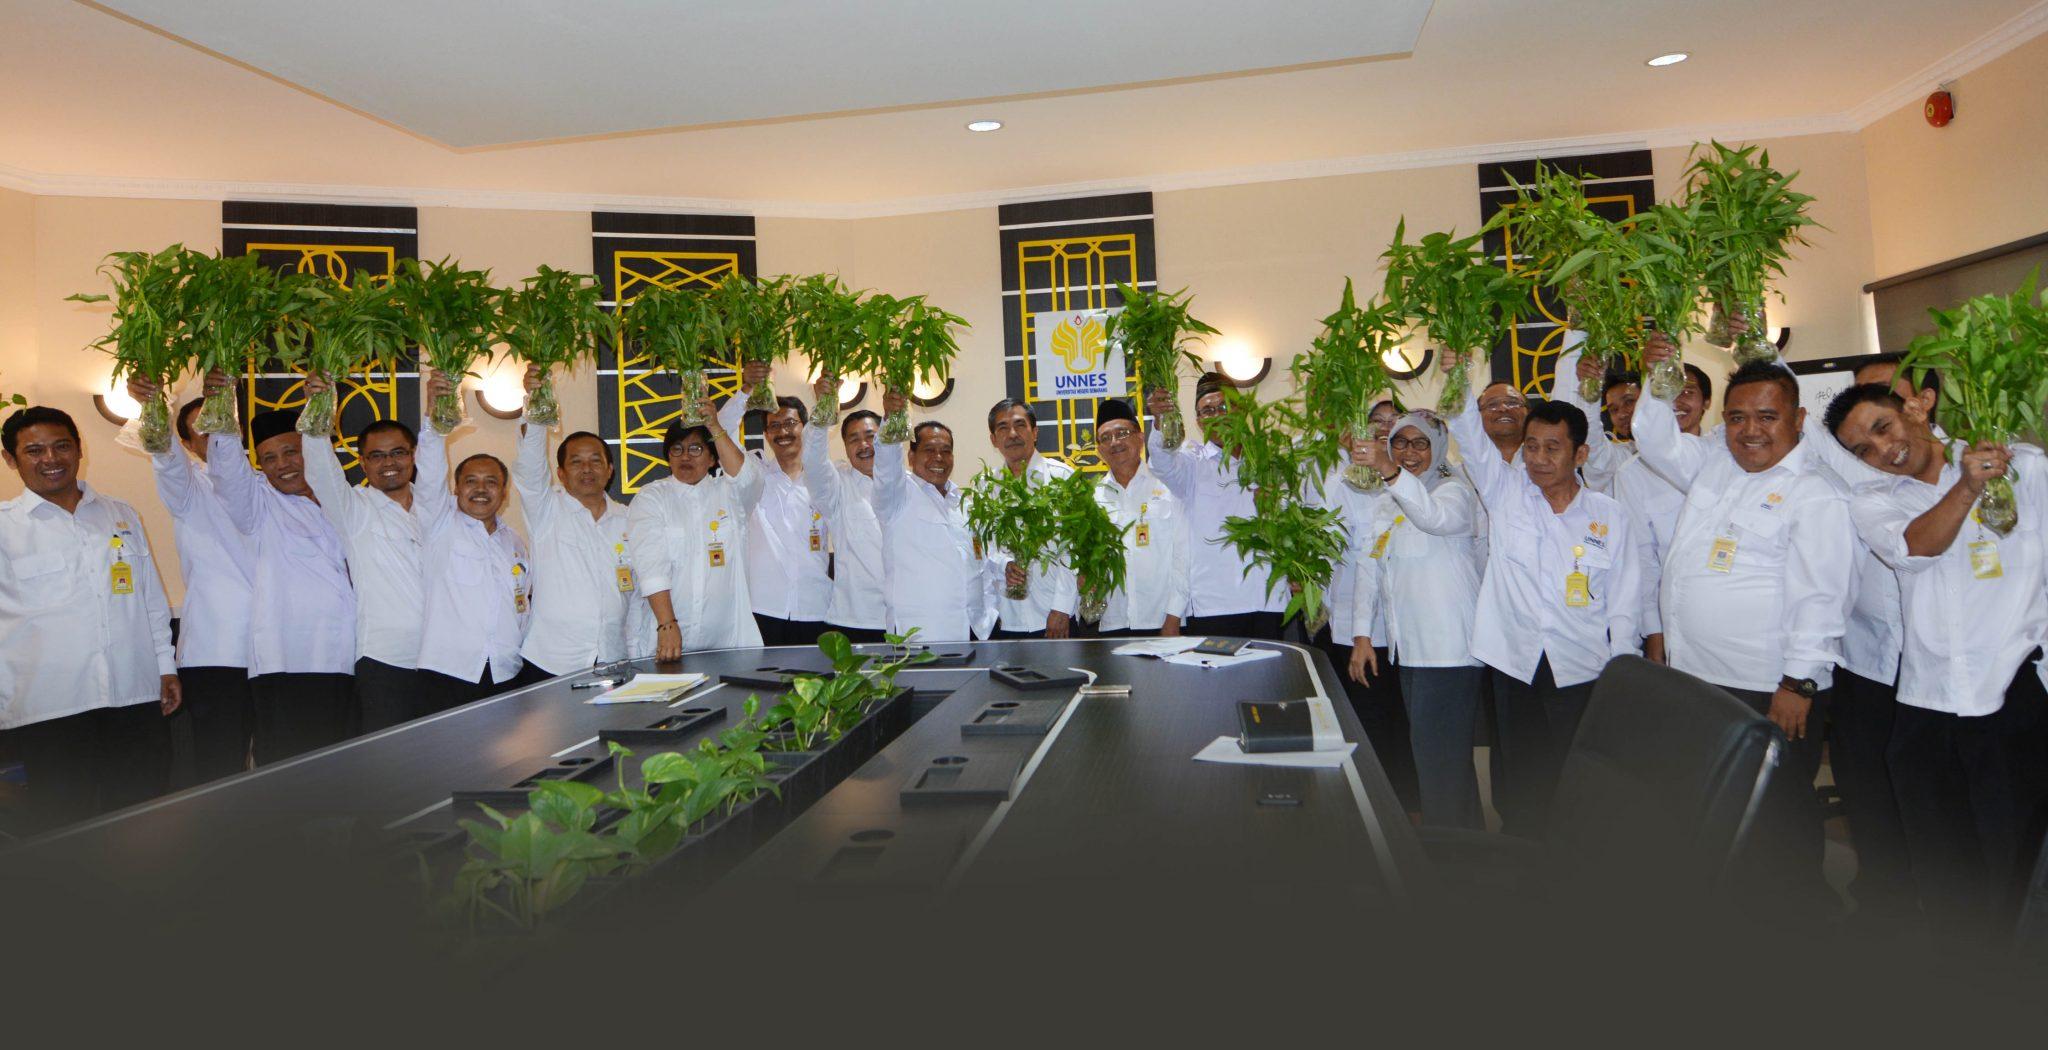 Rumah Hidroponik Ecofarm UNNES Panen Perdana Kangkung